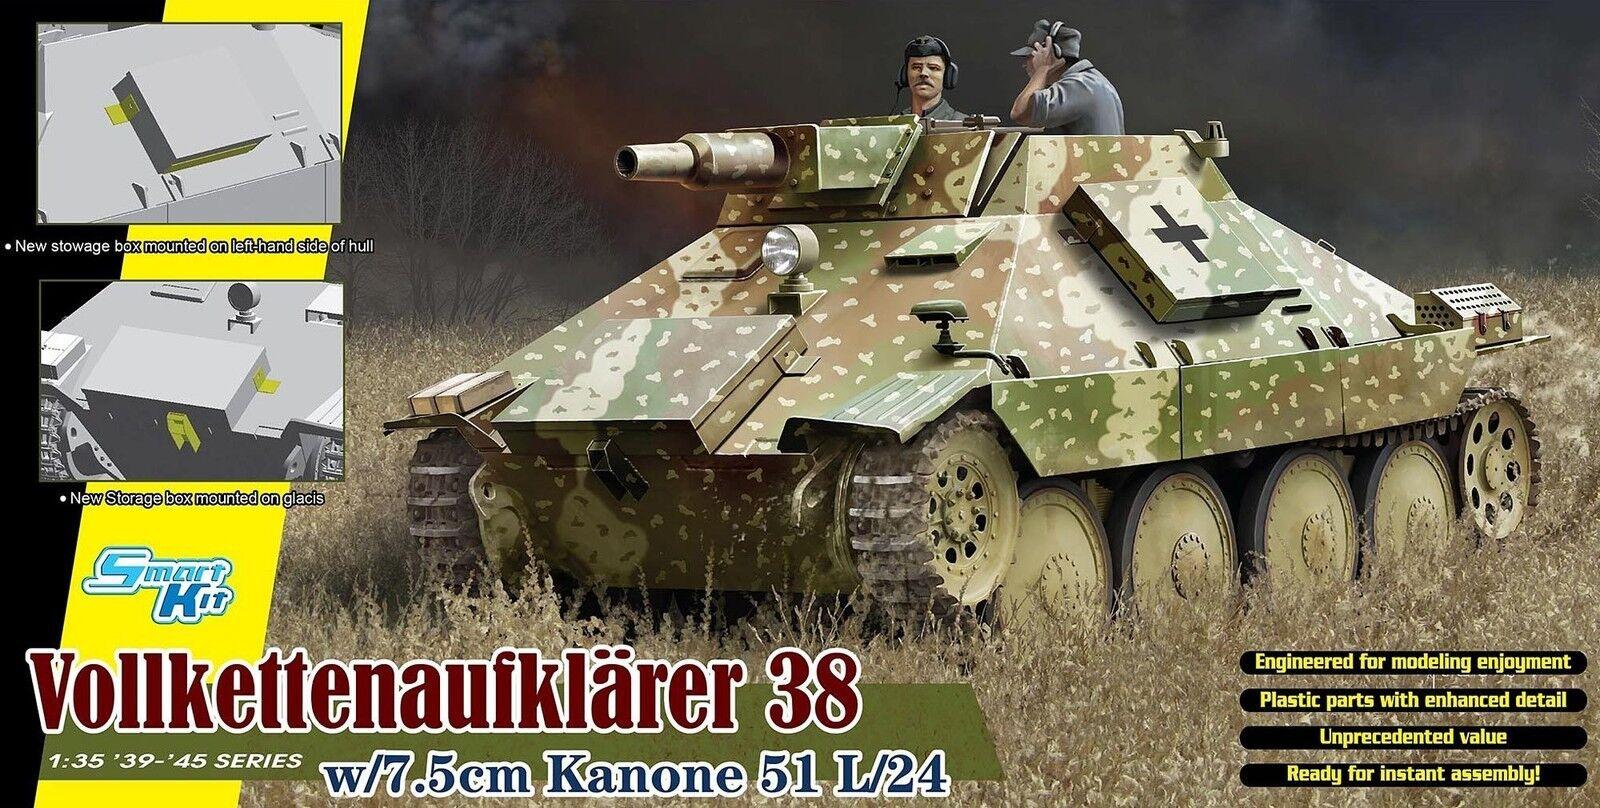 Dragon 1 3 5 6815  vollkettenaufklärer 38 with 7.5cm Canon 51 L 24